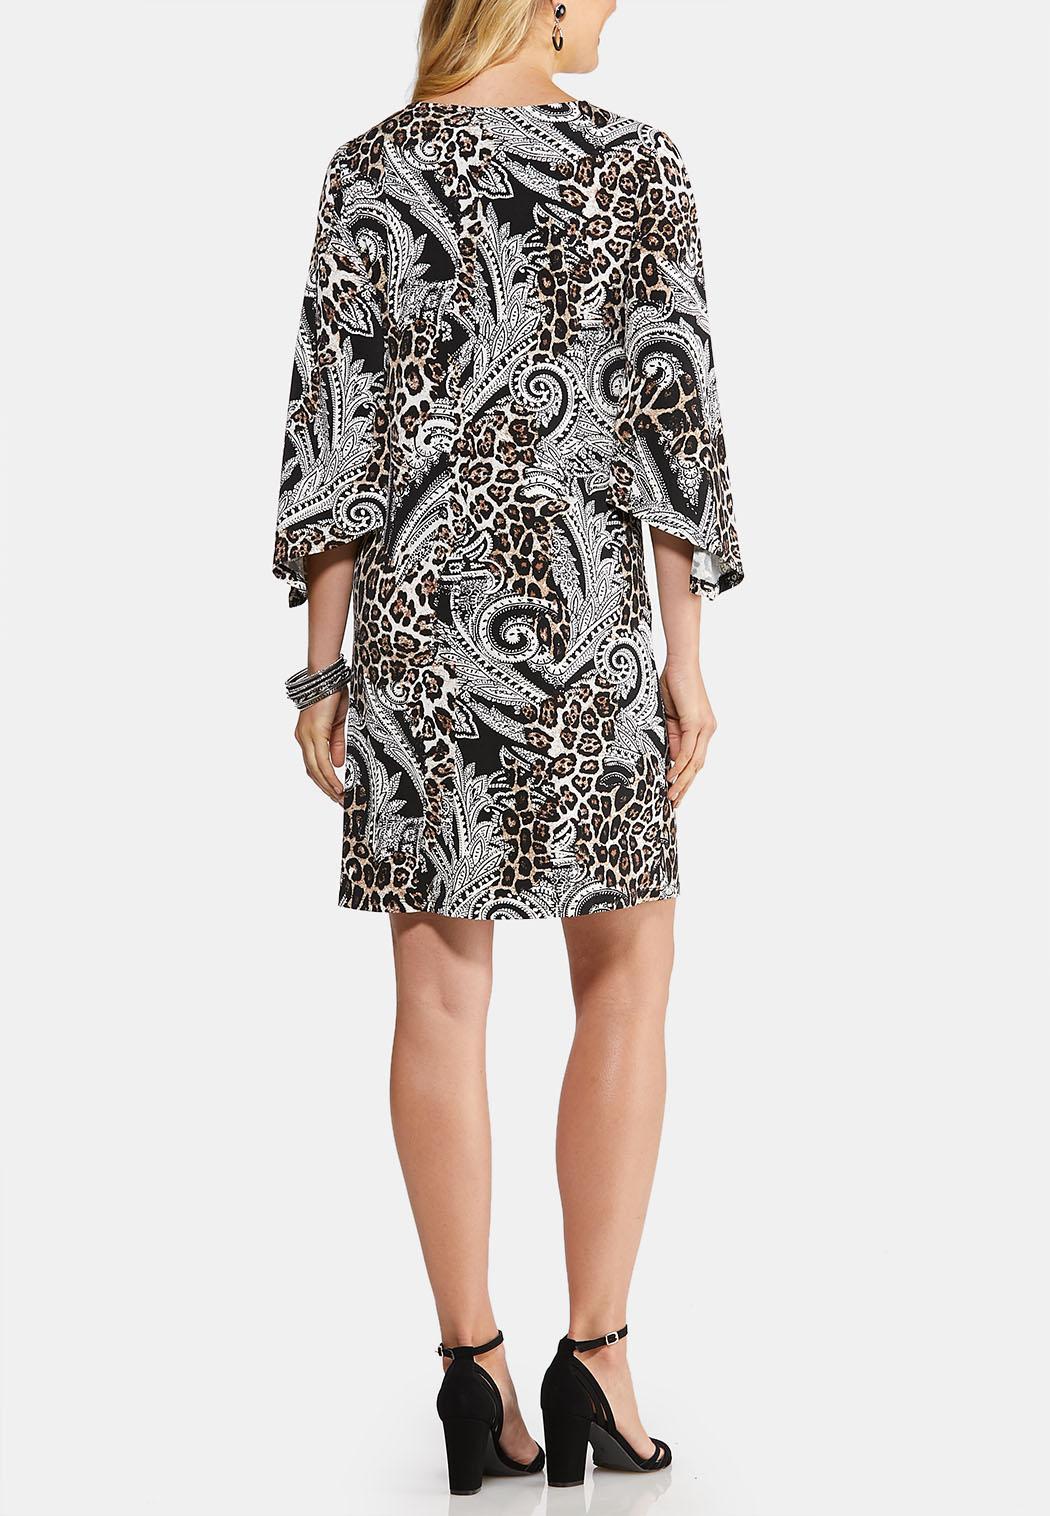 Plus Size Textured Animal Paisley Dress (Item #43918016)